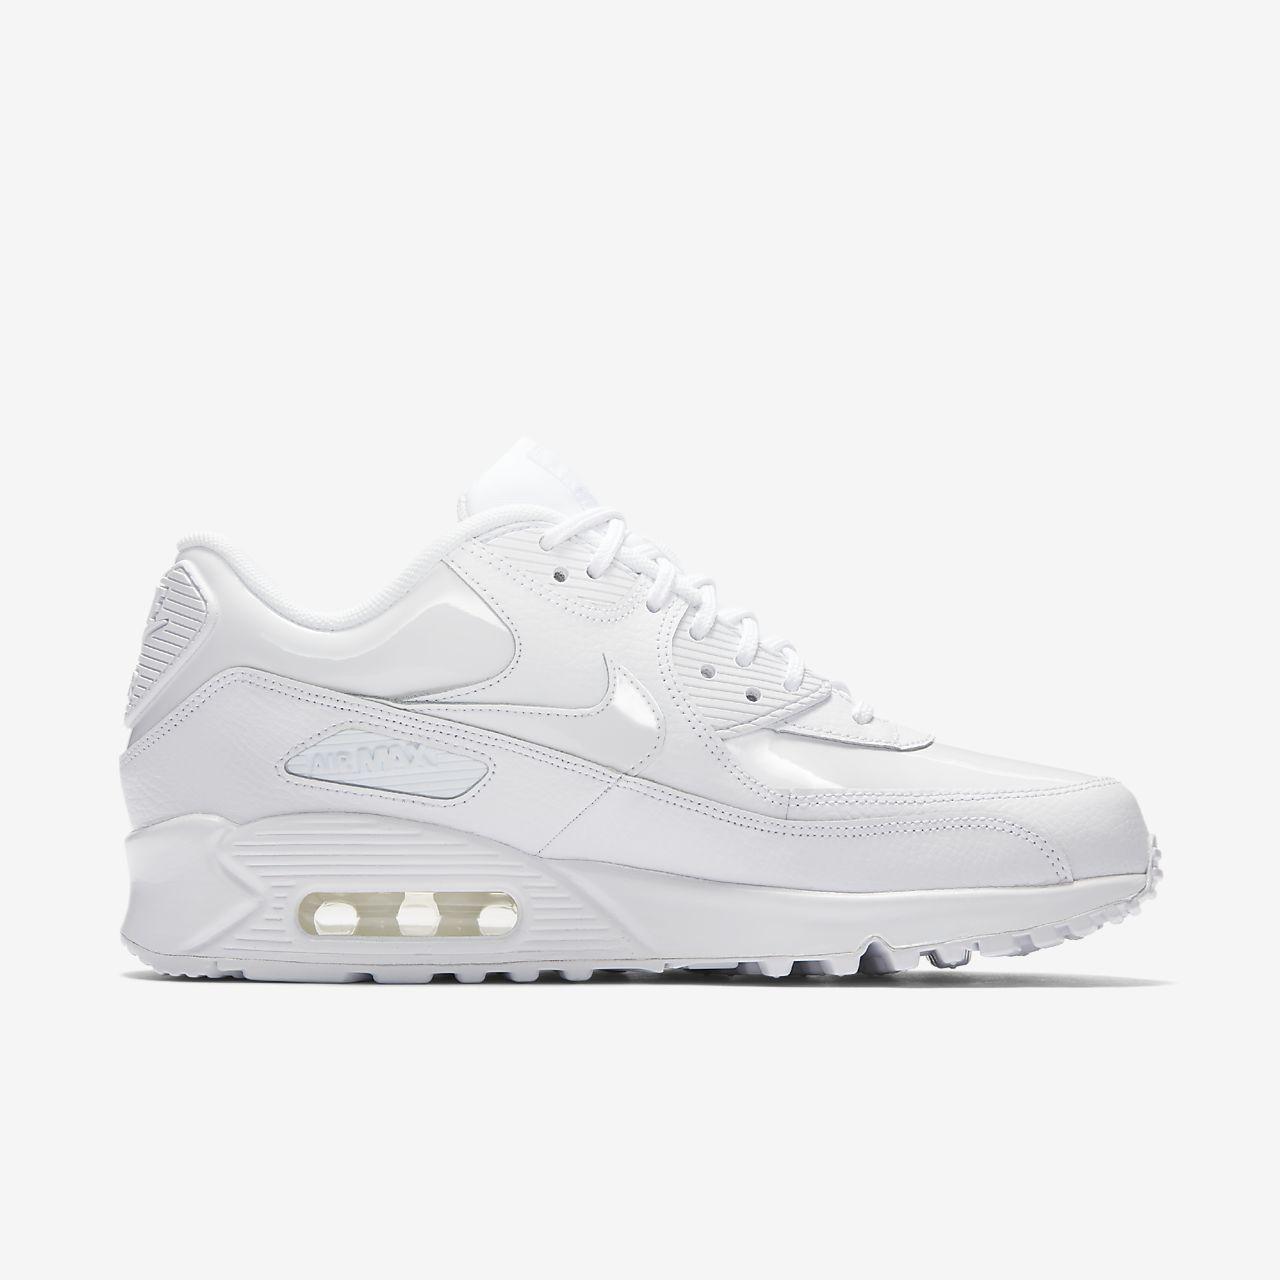 Nike Air Max 90 Patent Damenschuh - Weiß 58mgWtT